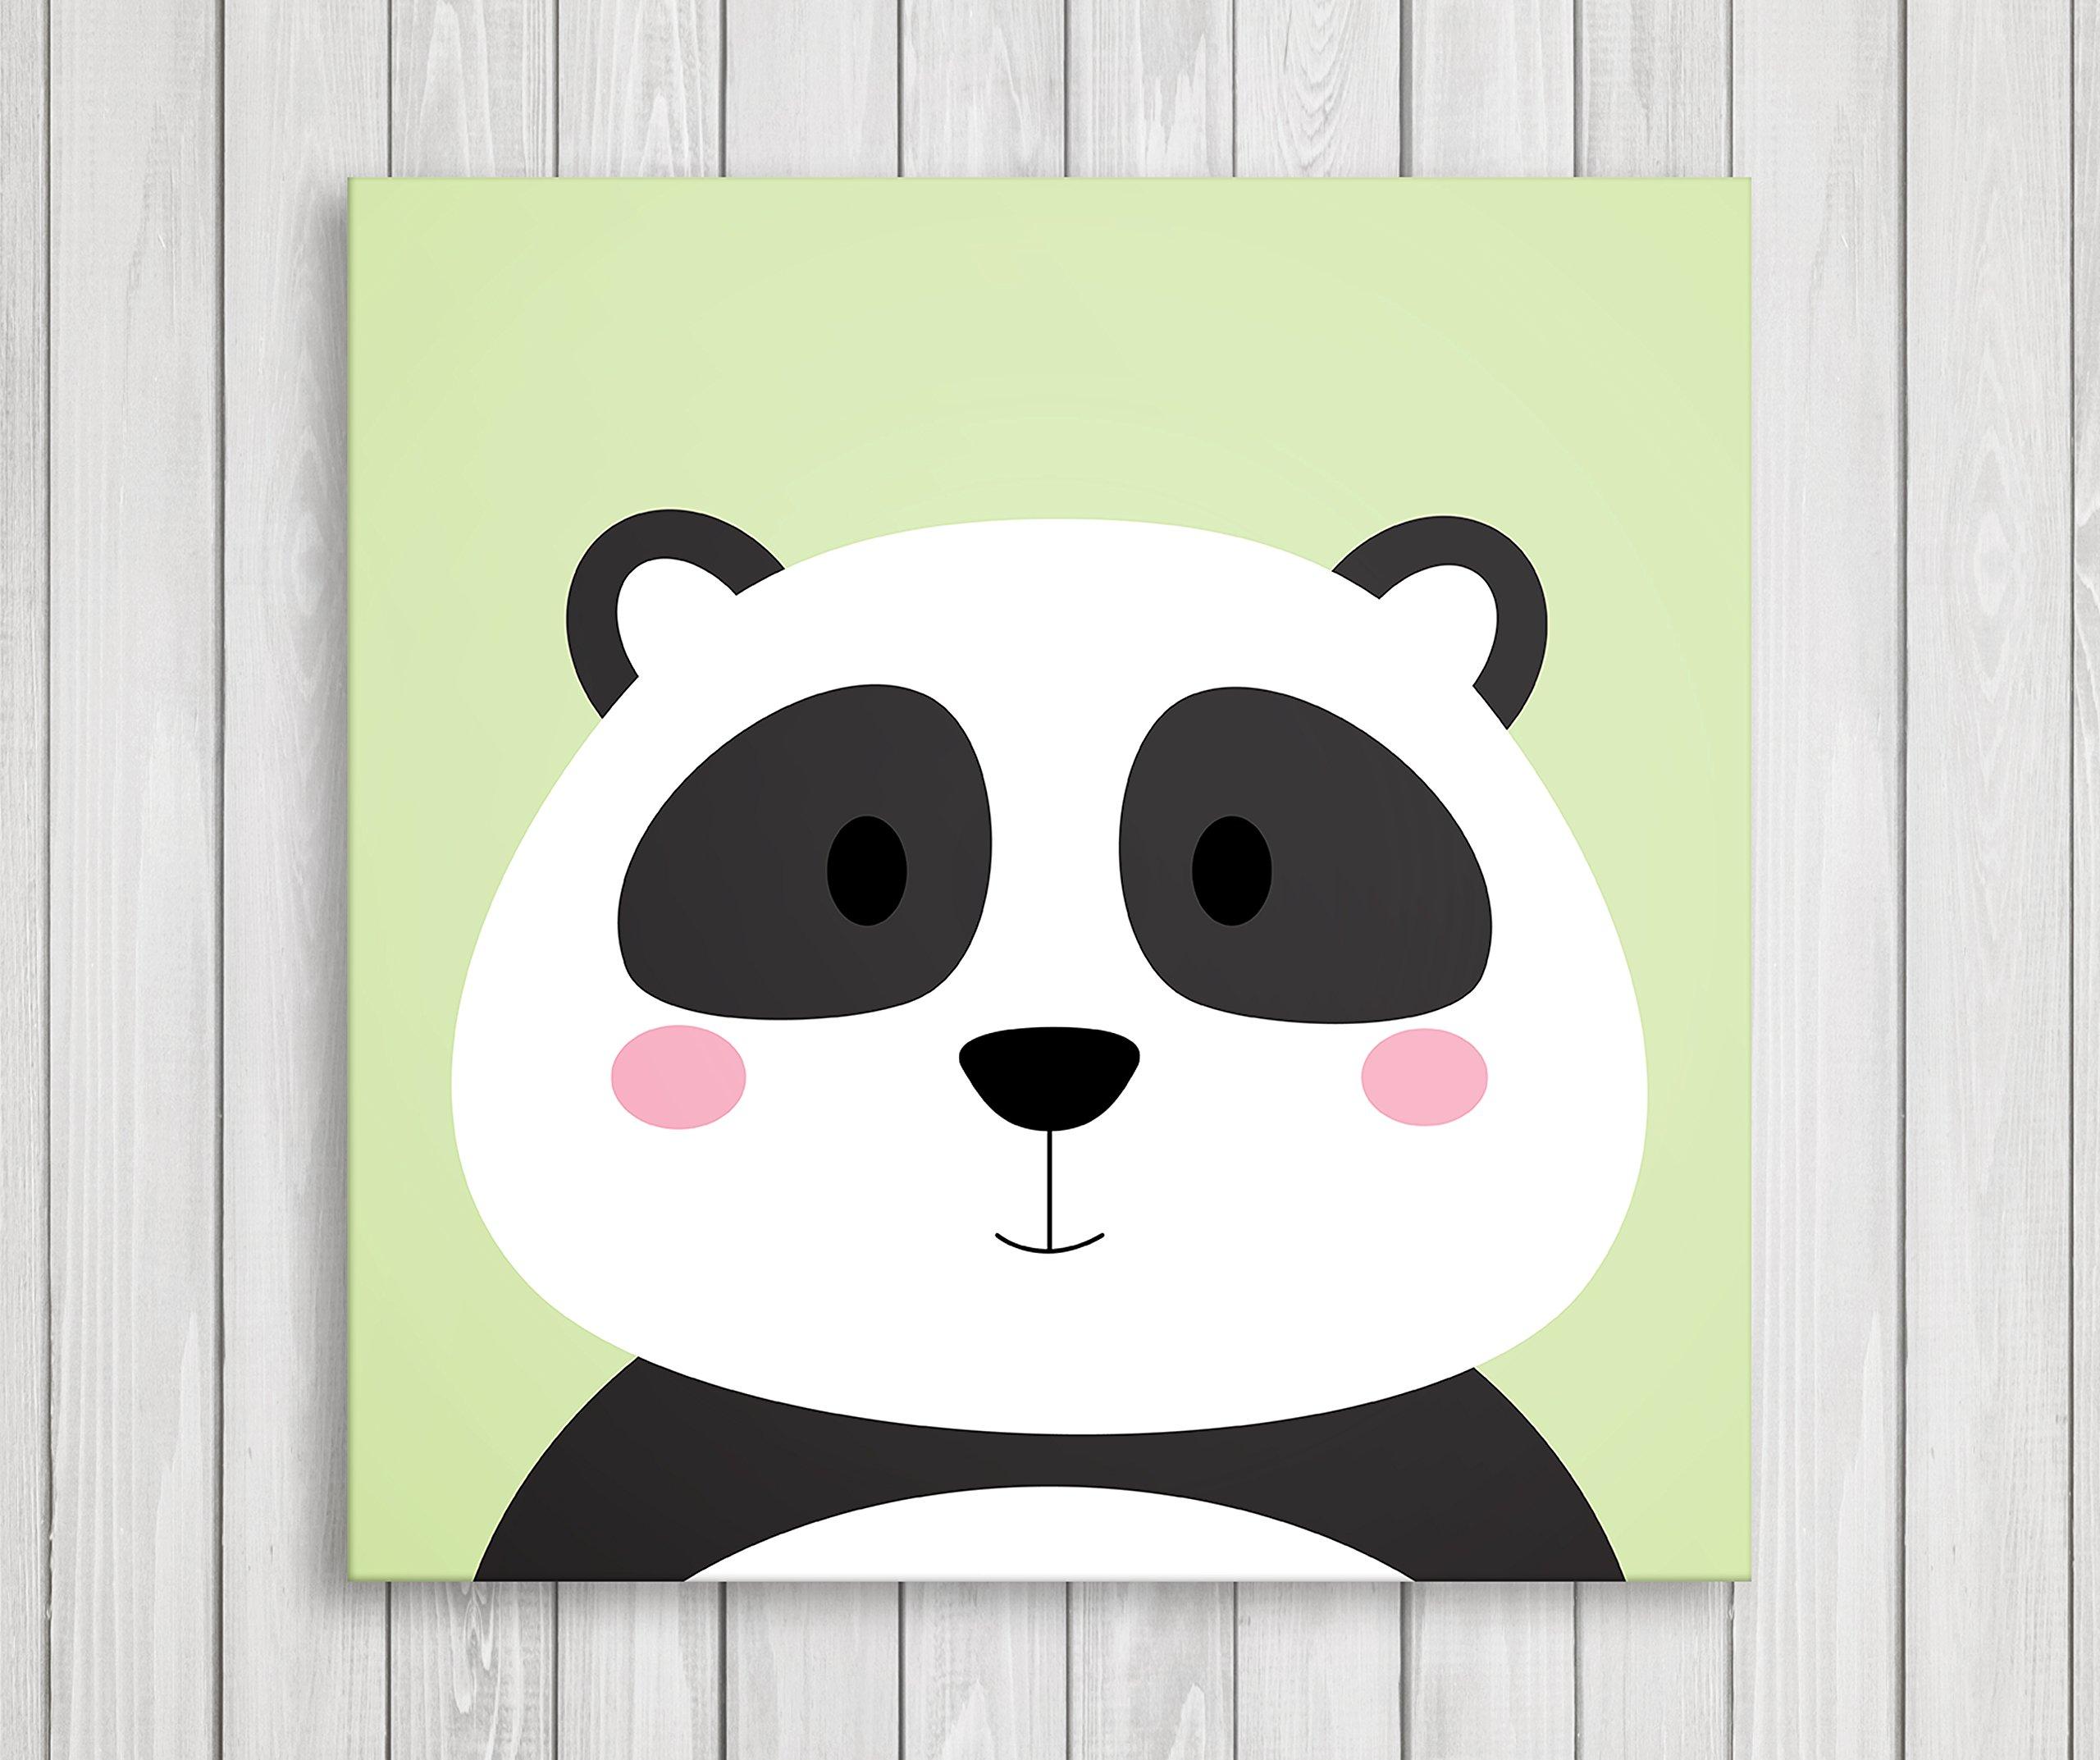 "Cute Little Animals, Nursery Canvas Print Wall Decor, Baby Kid Room Canvas Art Print, Safari Animals Poster Wall Art Print, Great Baby Shower Gift Set Idea - Ready to Hang (11""W x 11""H, Panda)"